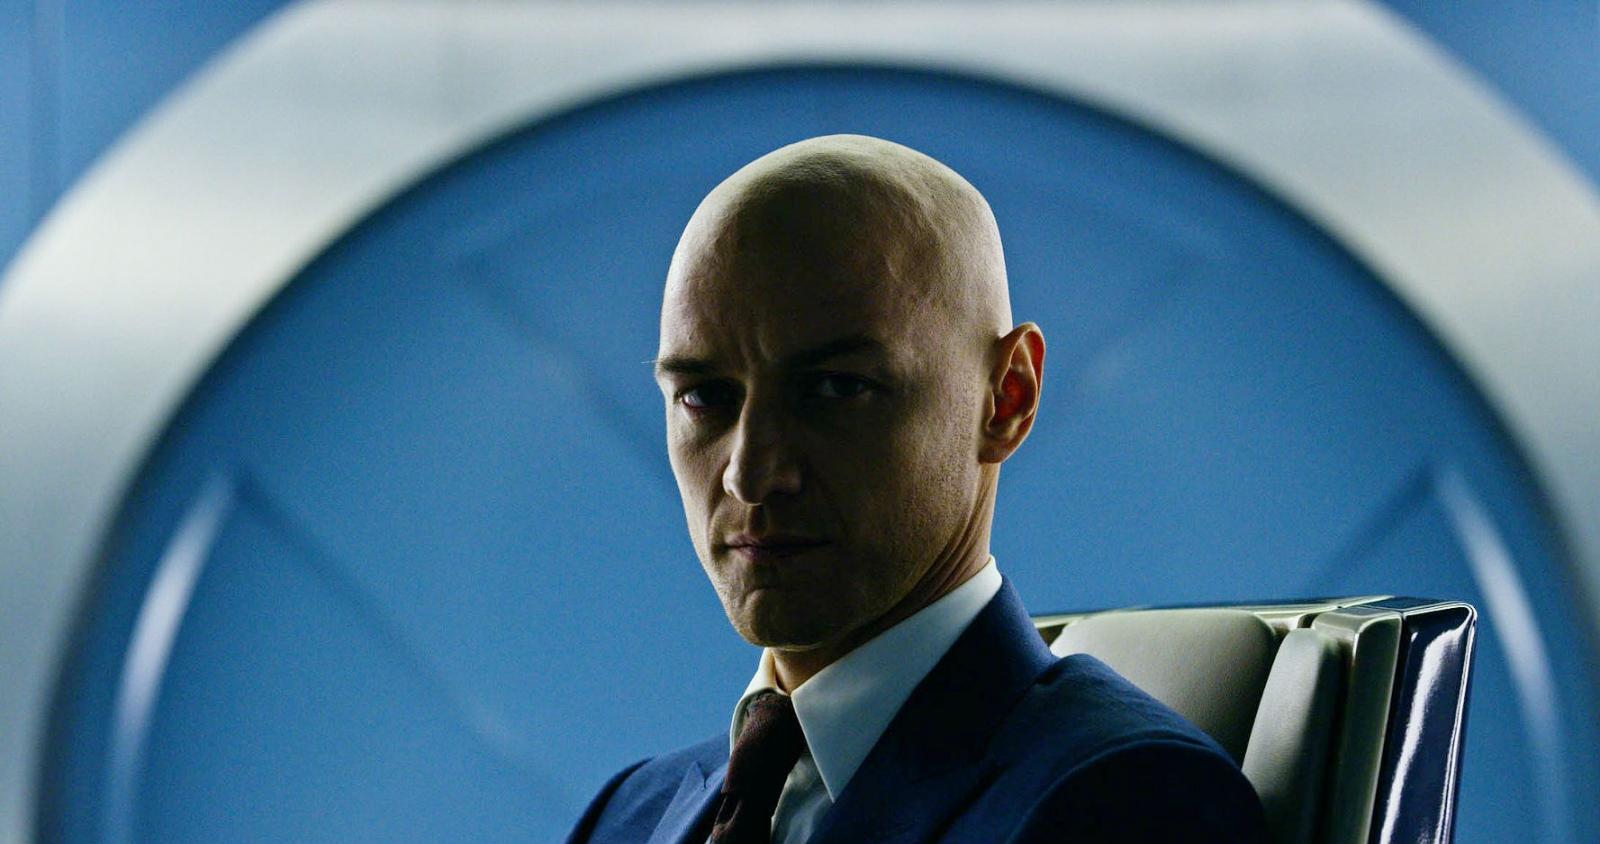 James McAvoy as Professor X